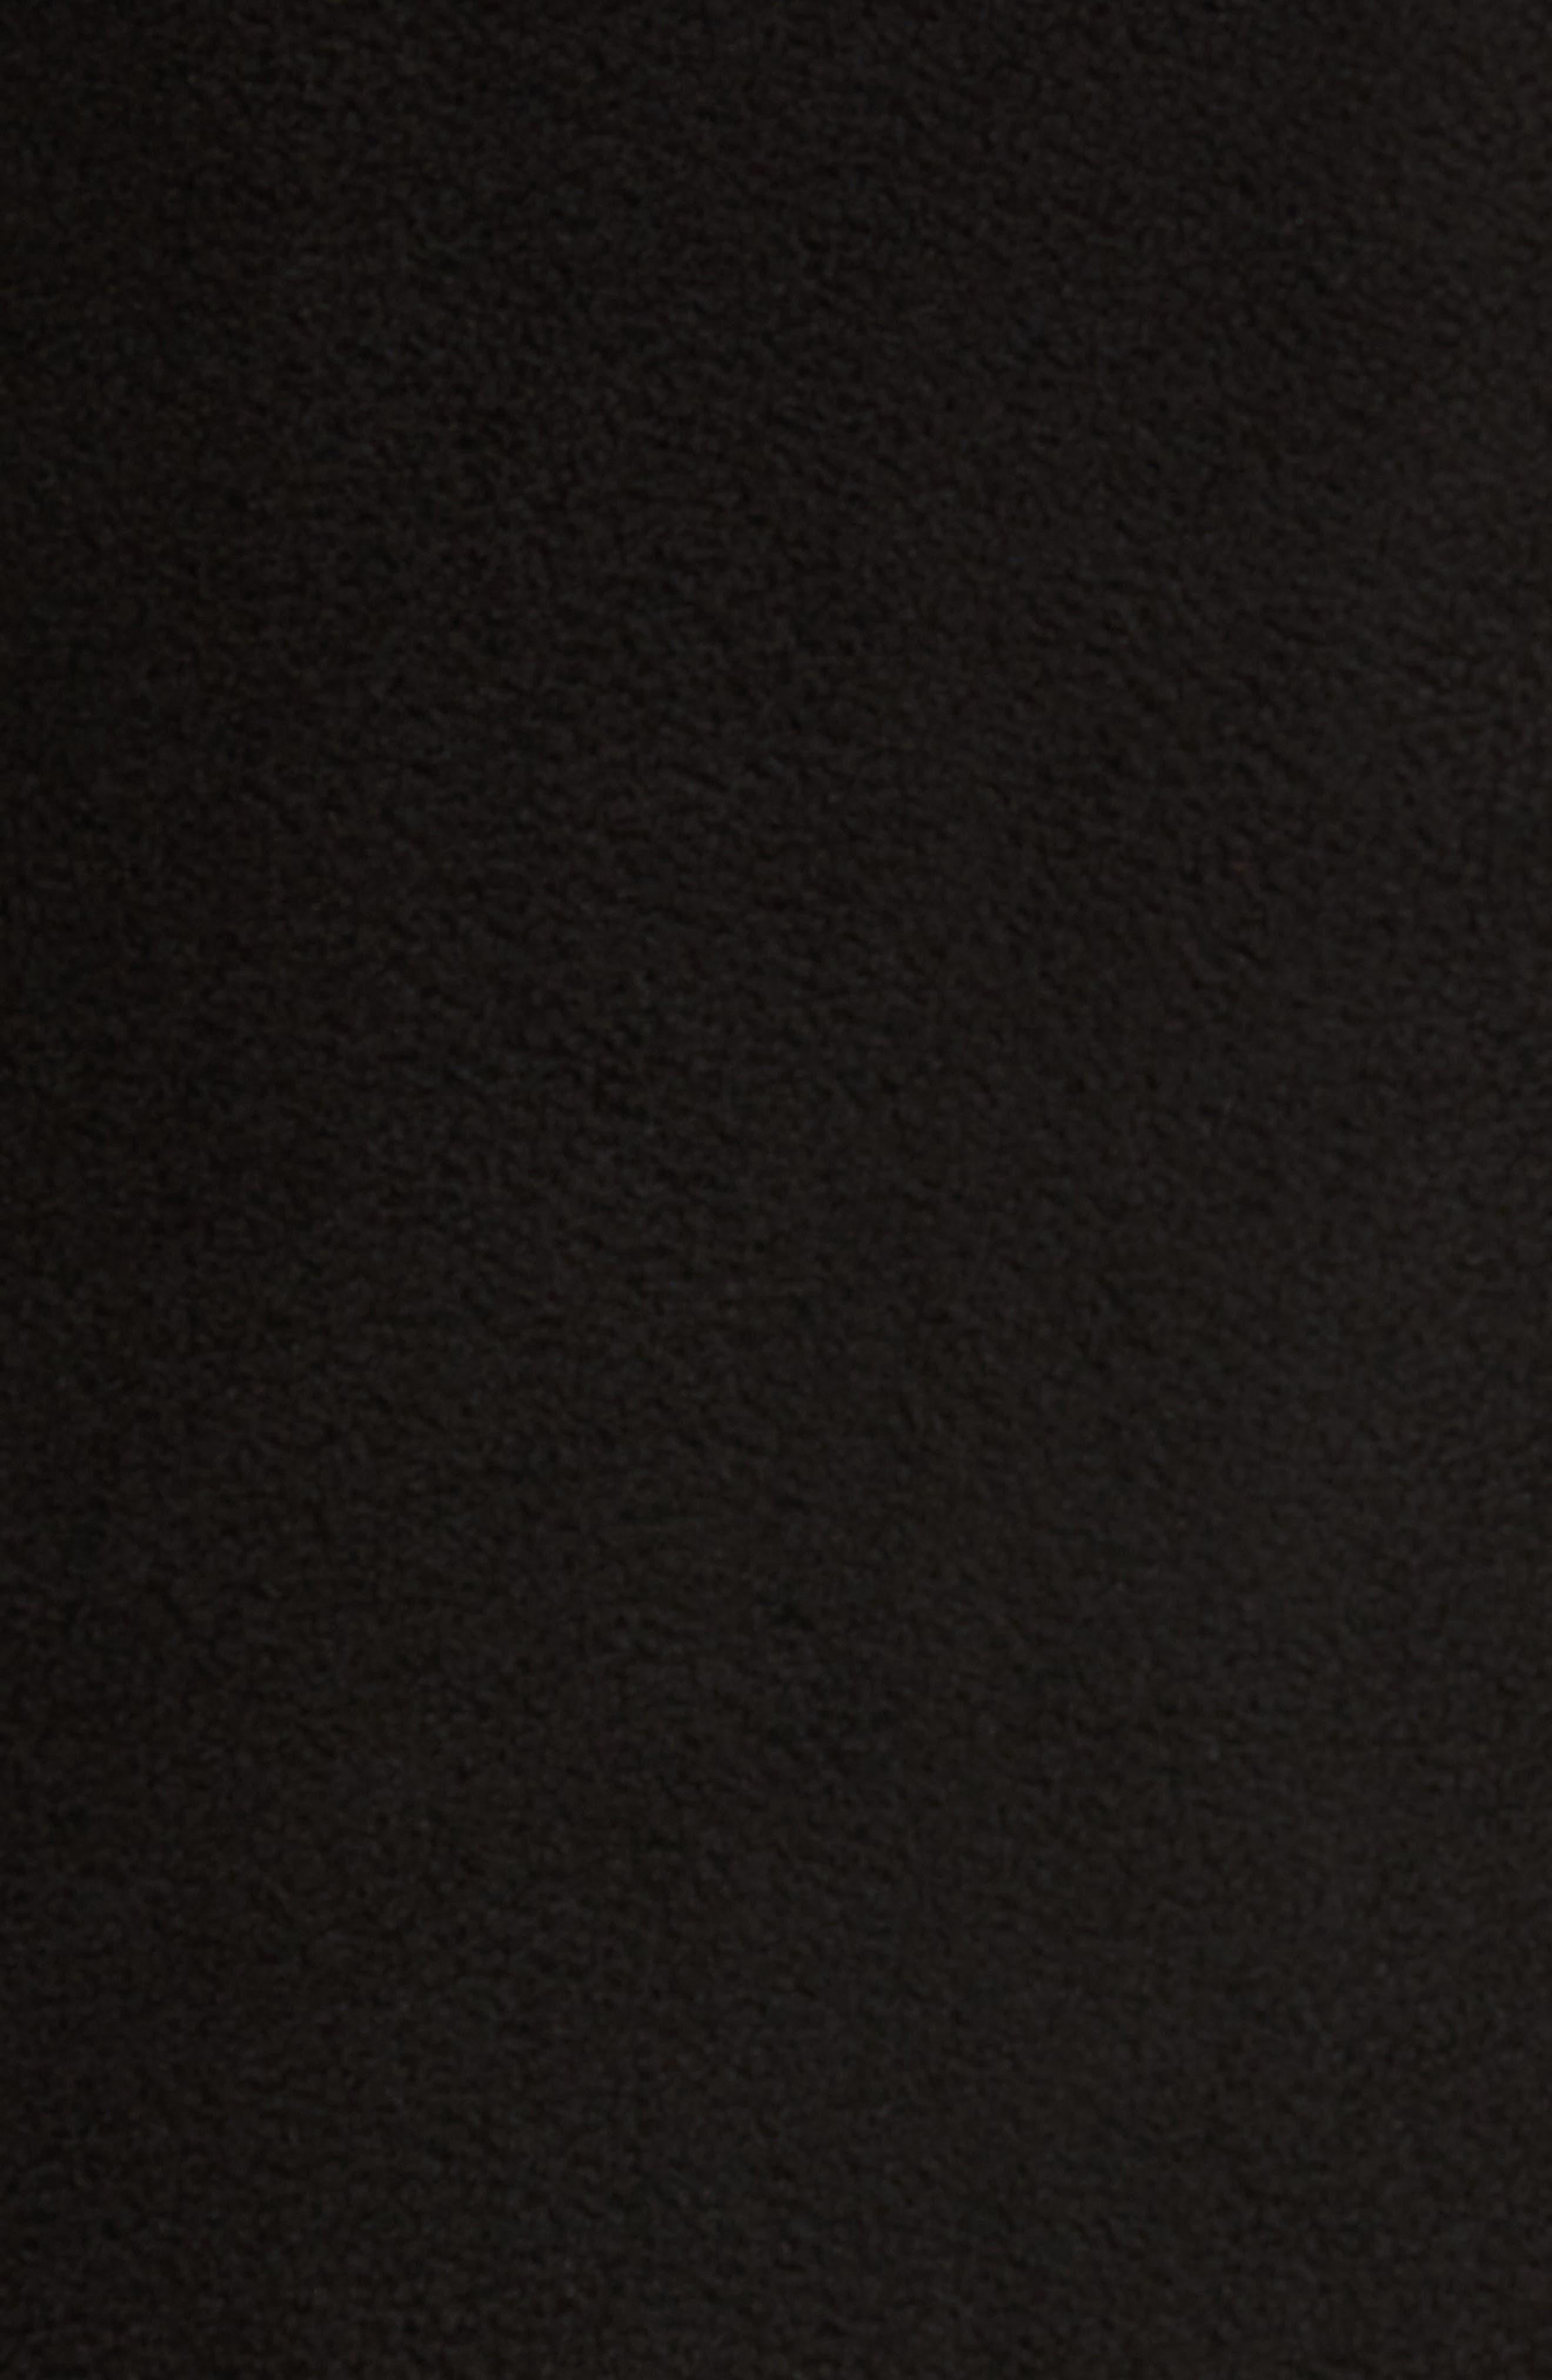 State Sweatshirt,                             Alternate thumbnail 5, color,                             BLACK